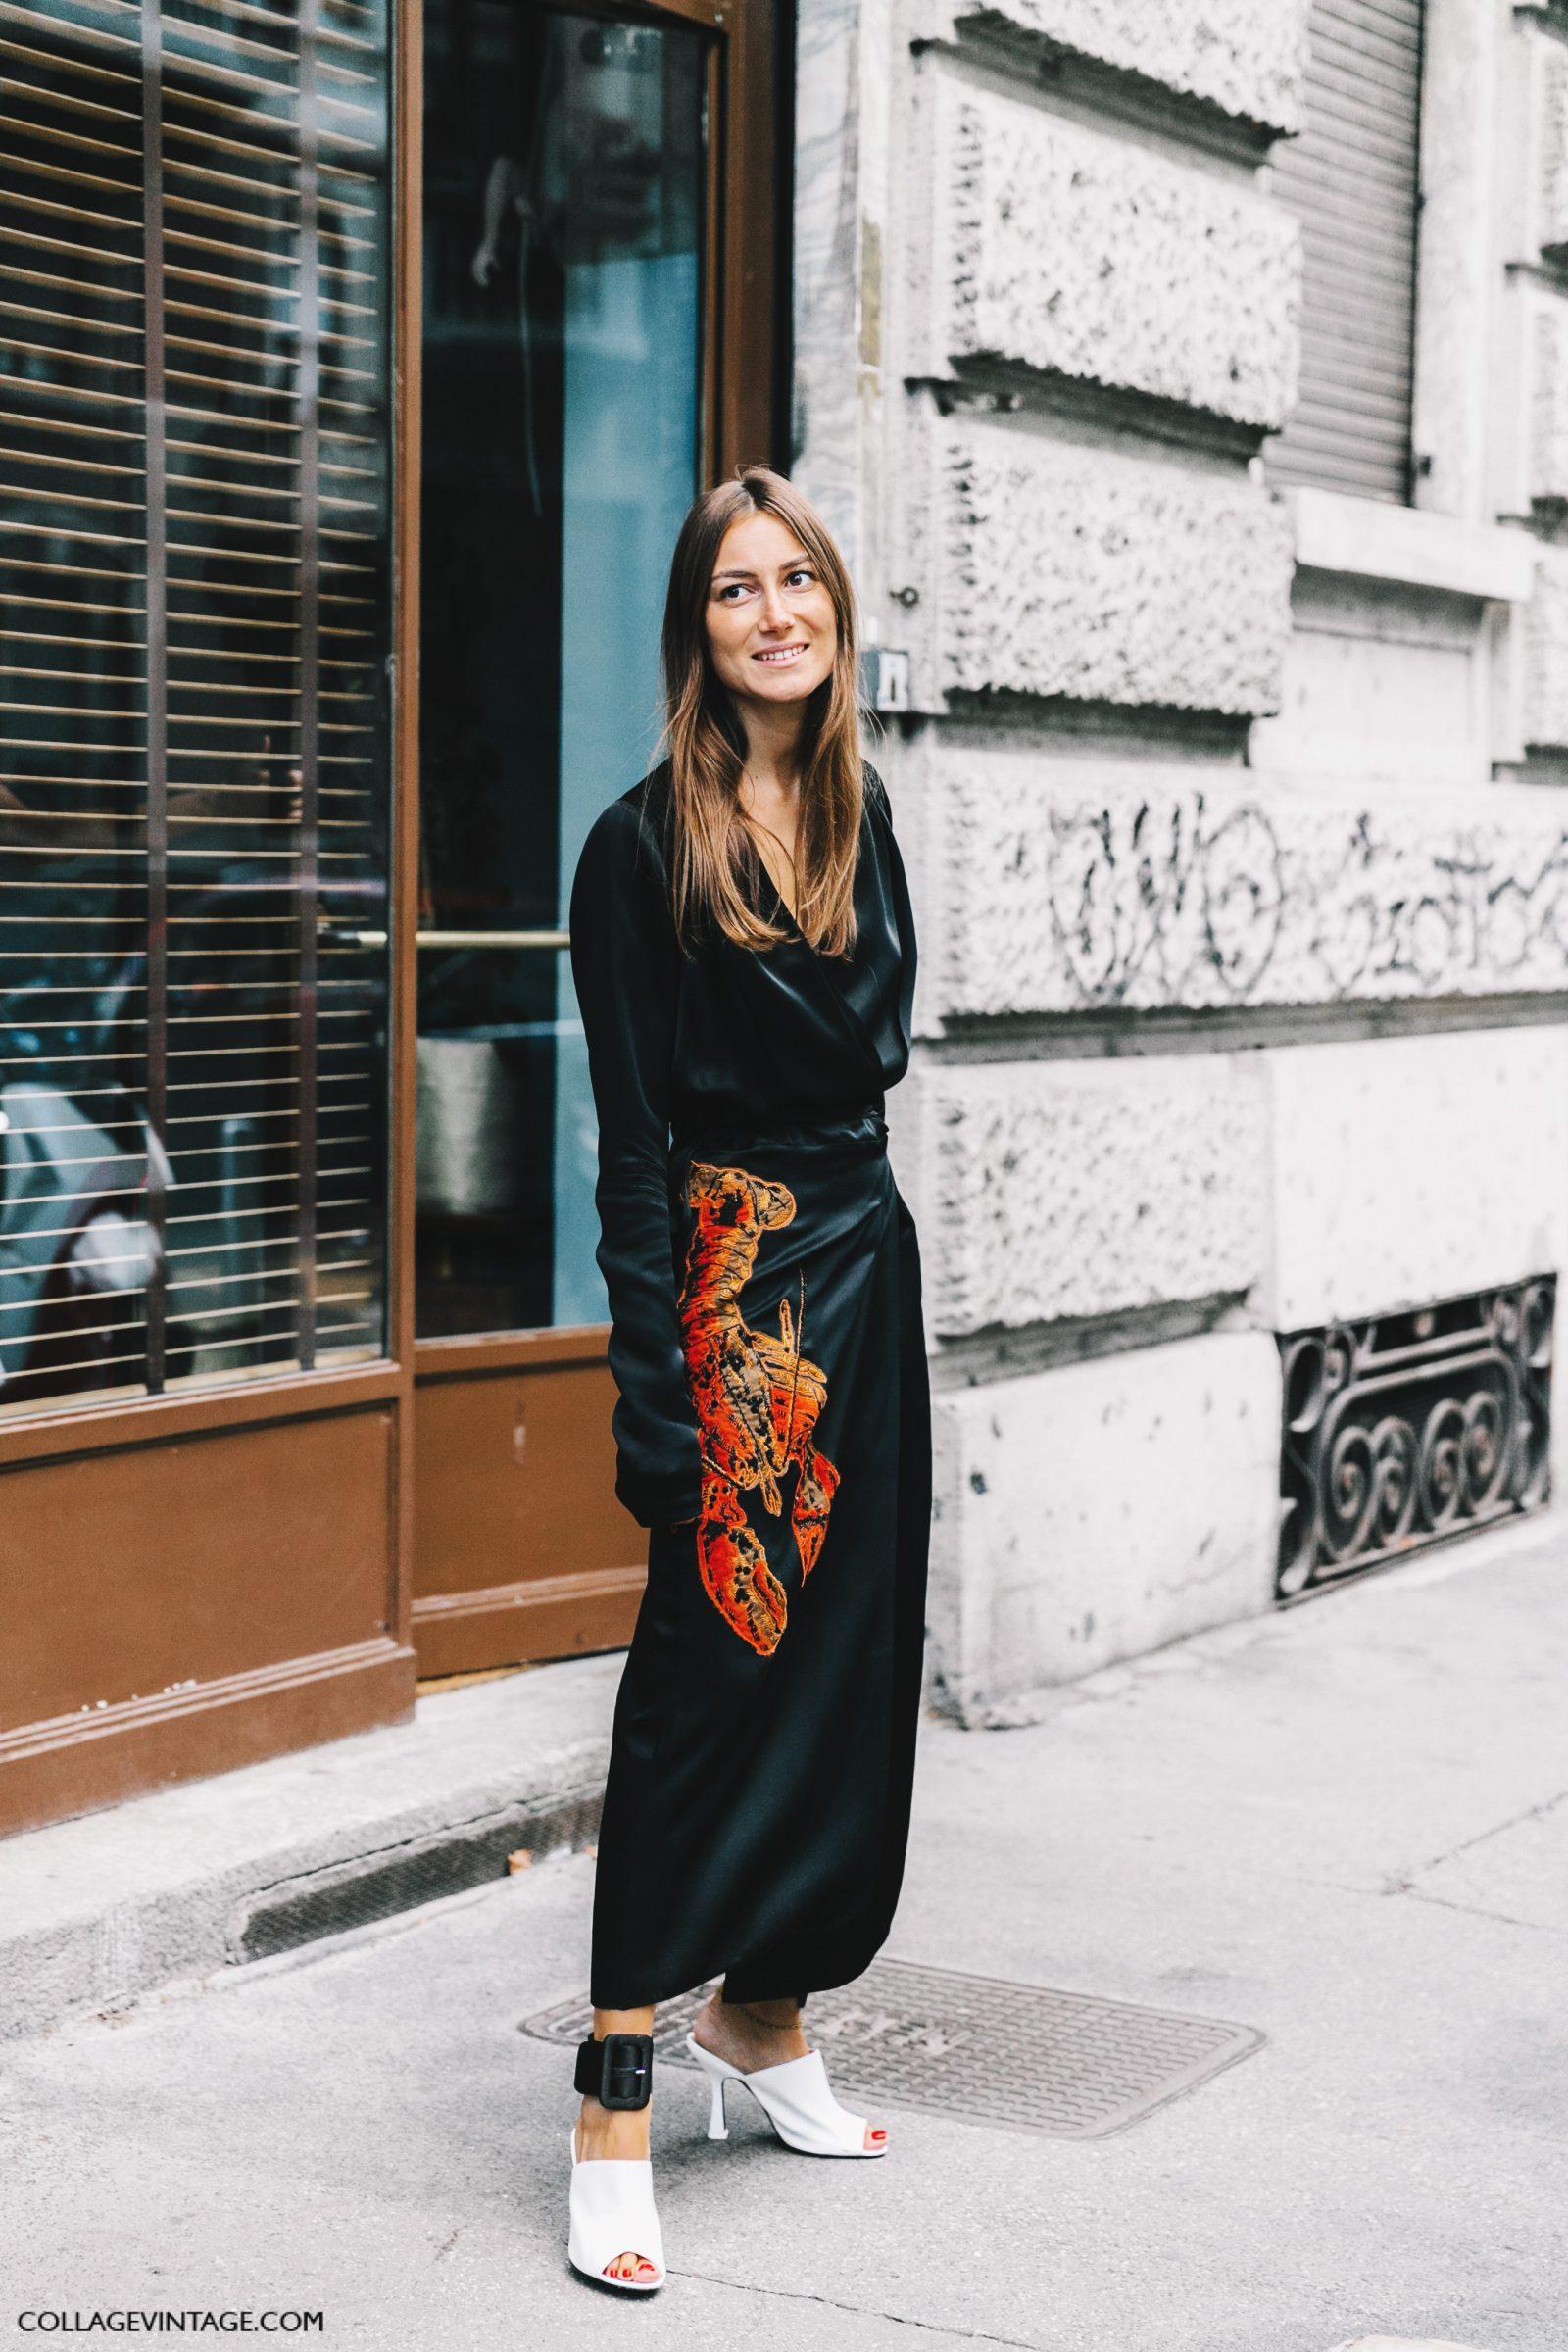 mfw-milan_fashion_week_ss17-street_style-outfits-collage_vintage-gucci-numero_21-alberta_ferreti-189